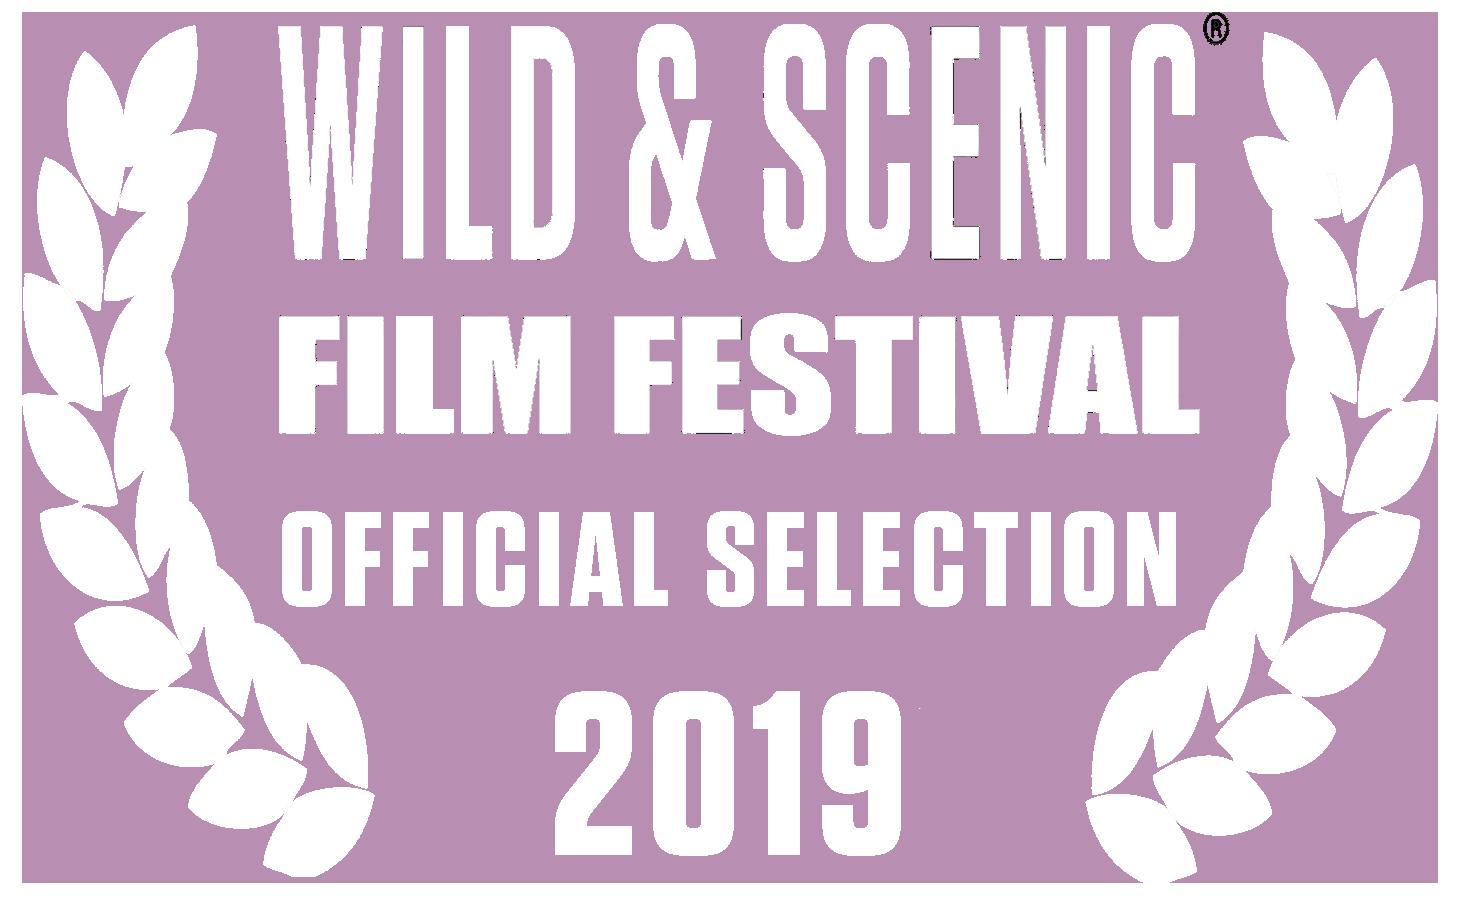 2019_WildScenicFF_WhiteLaurels.png